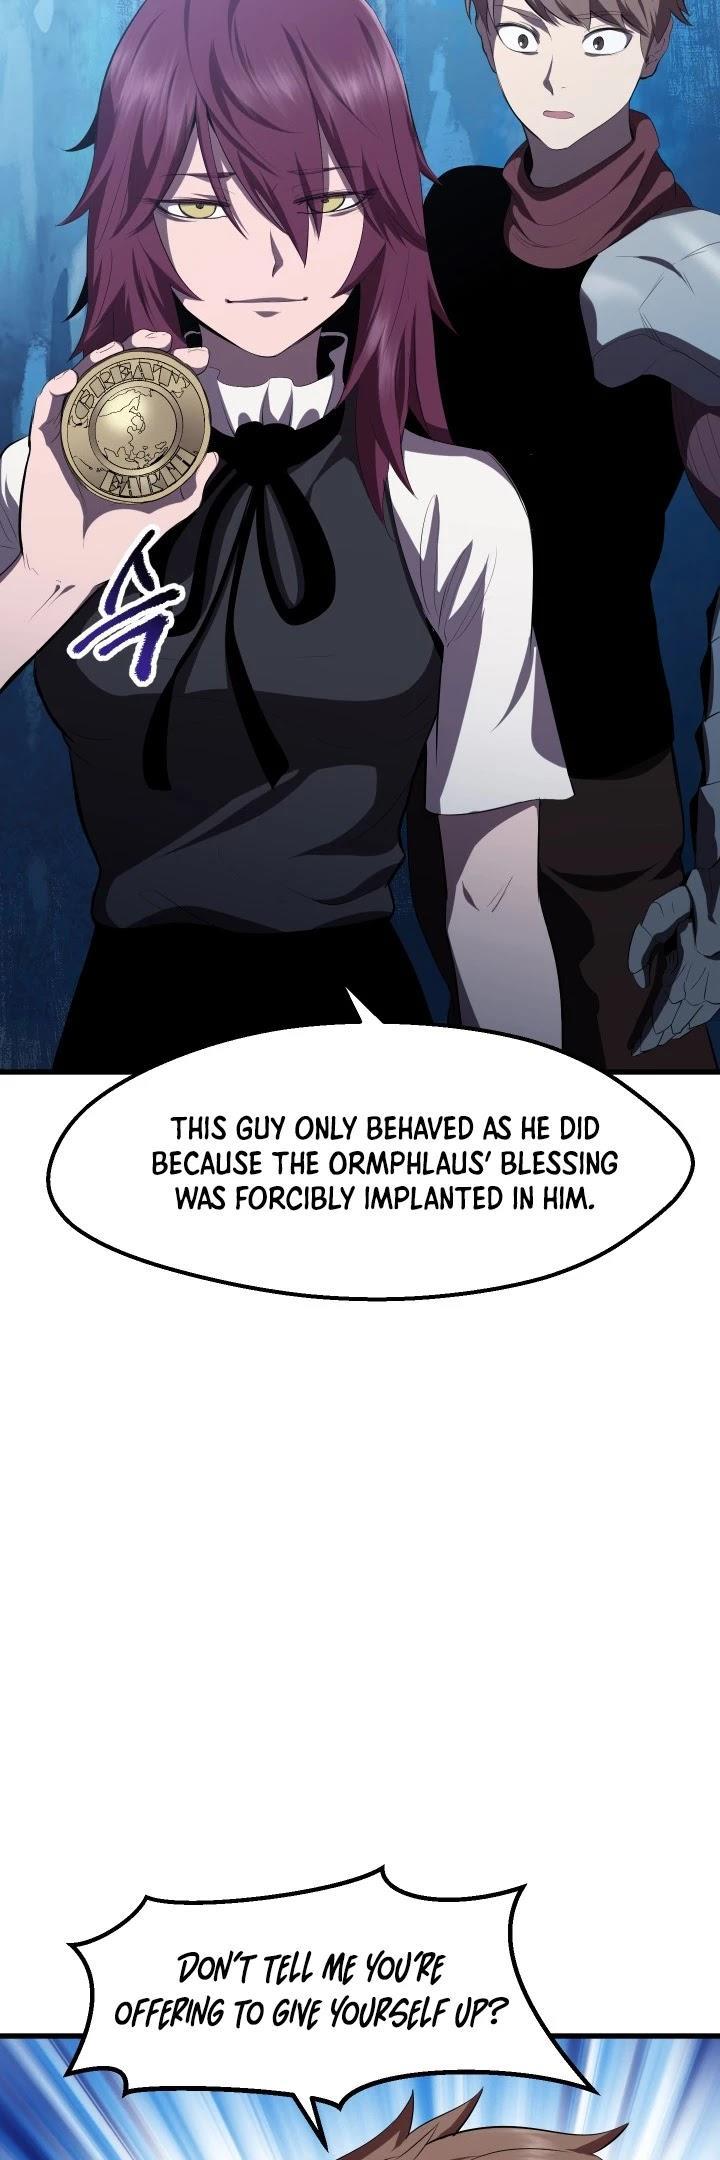 Survival Story Of A Sword King In A Fantasy World Chapter 68 page 7 - Mangakakalots.com